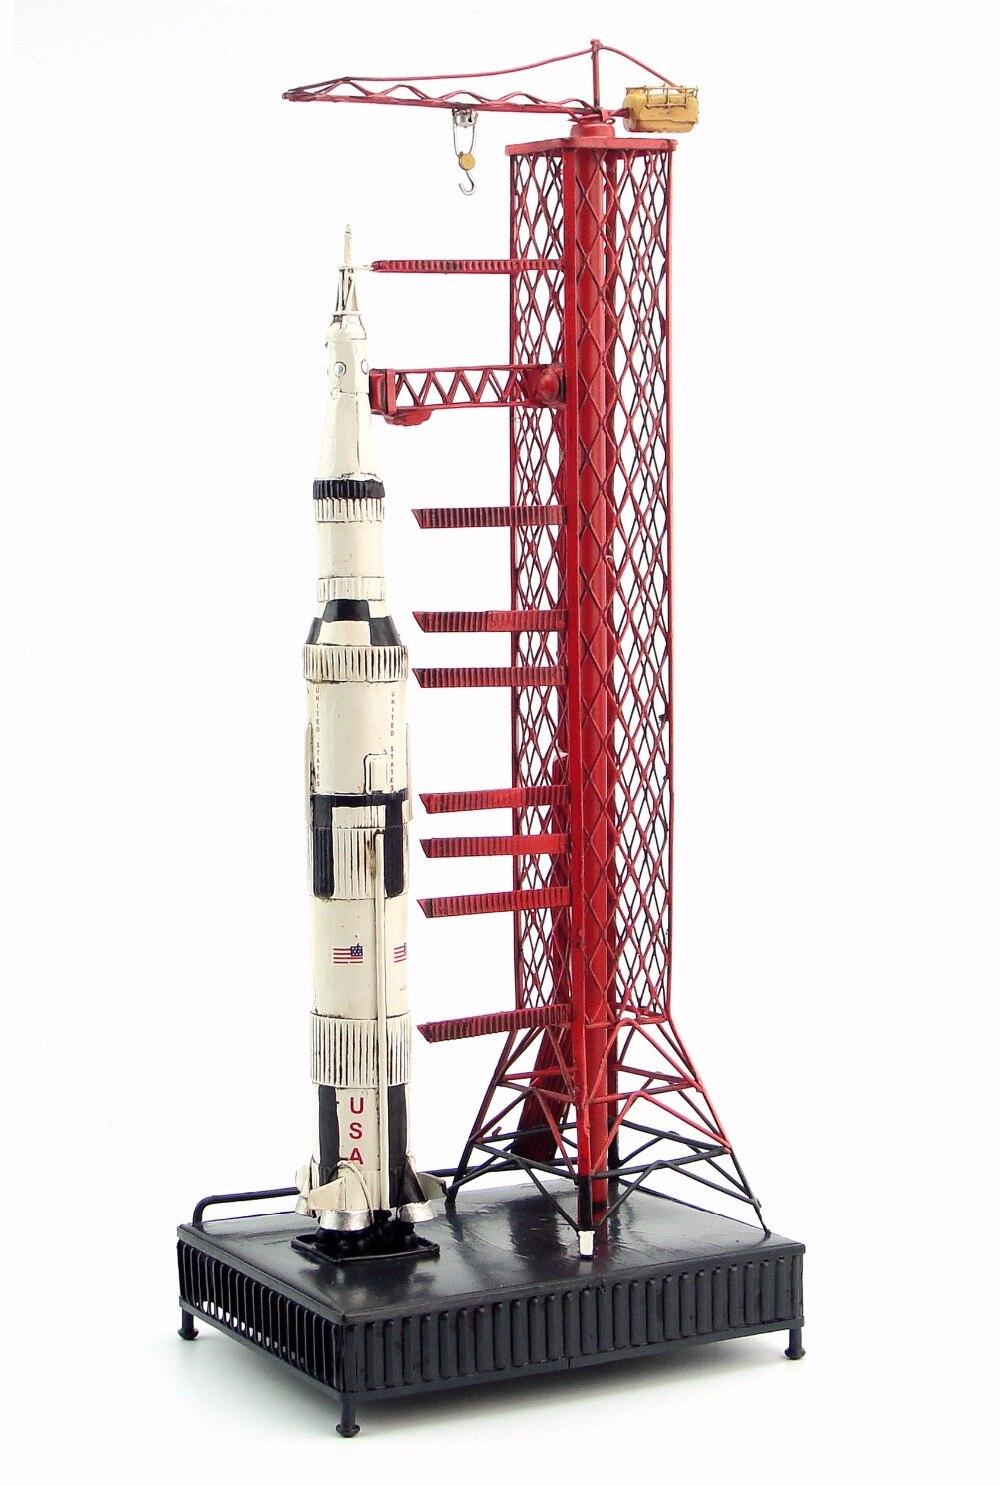 NASA Appollo pläne Saturn fünf rakete retro klassische schmieden ...